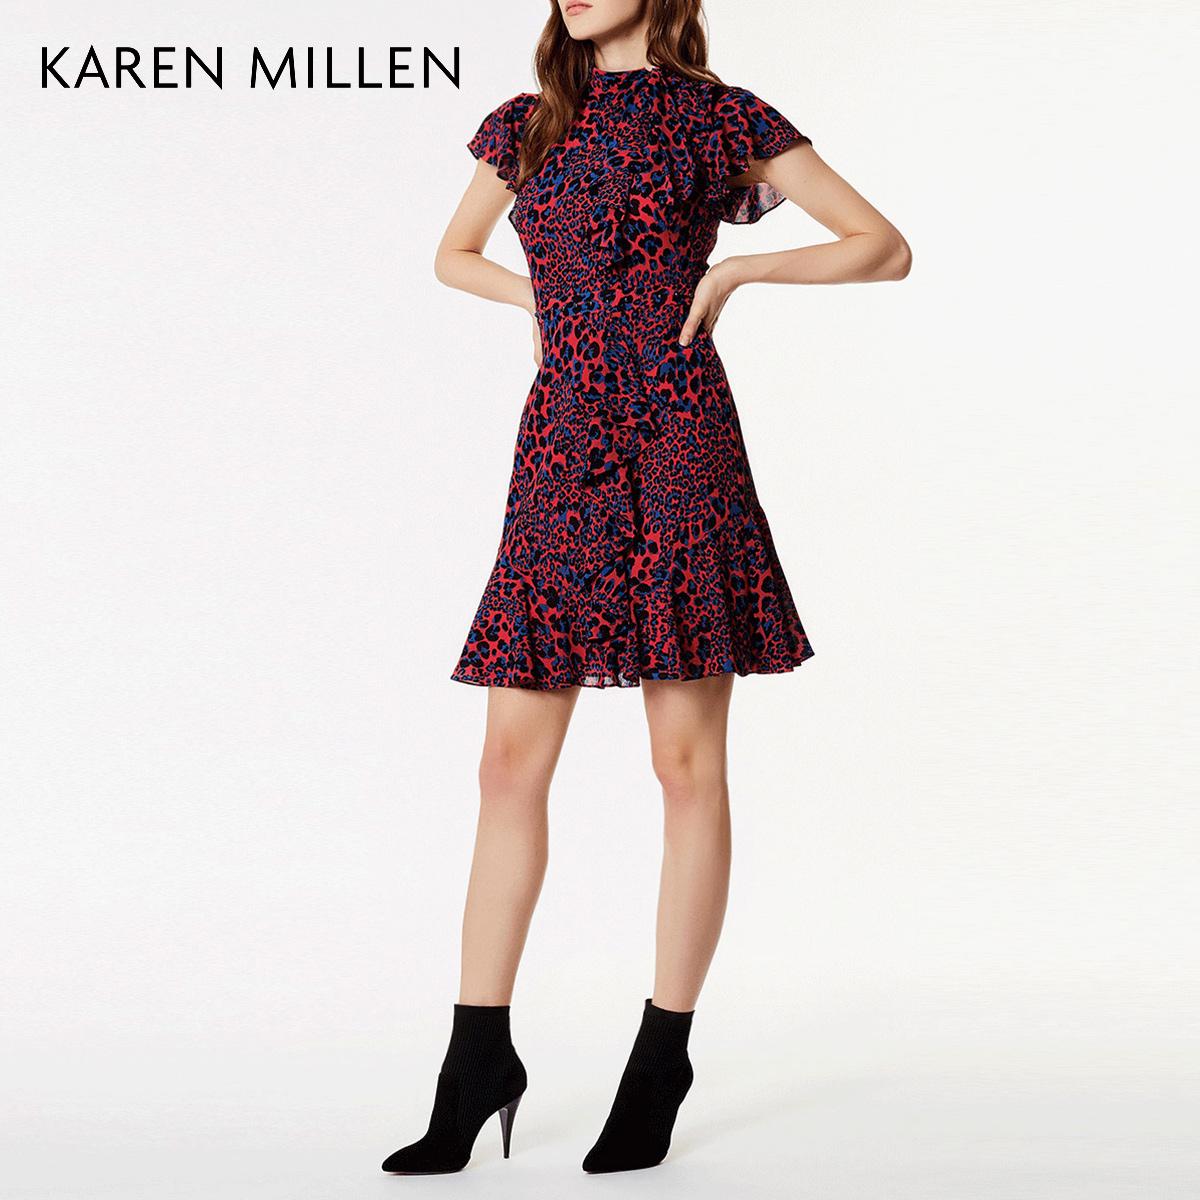 KAREN MILLEN凯伦米莲英伦女装2018春荷叶袖豹纹连衣裙KM51826710